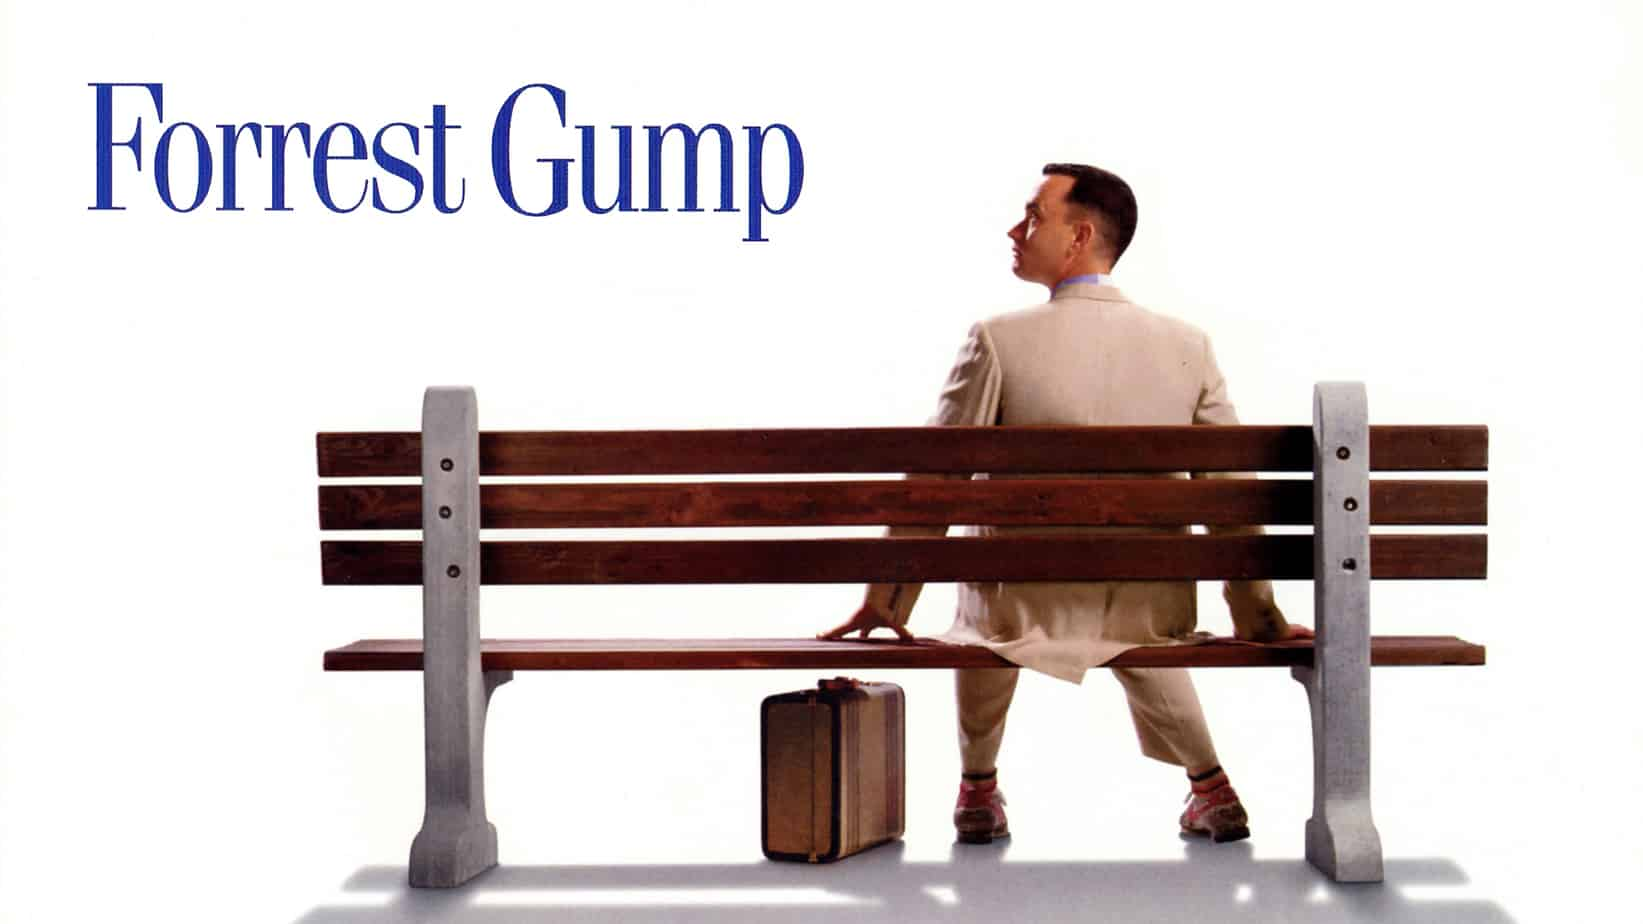 Forrest Gump (1994) - Svijet filma